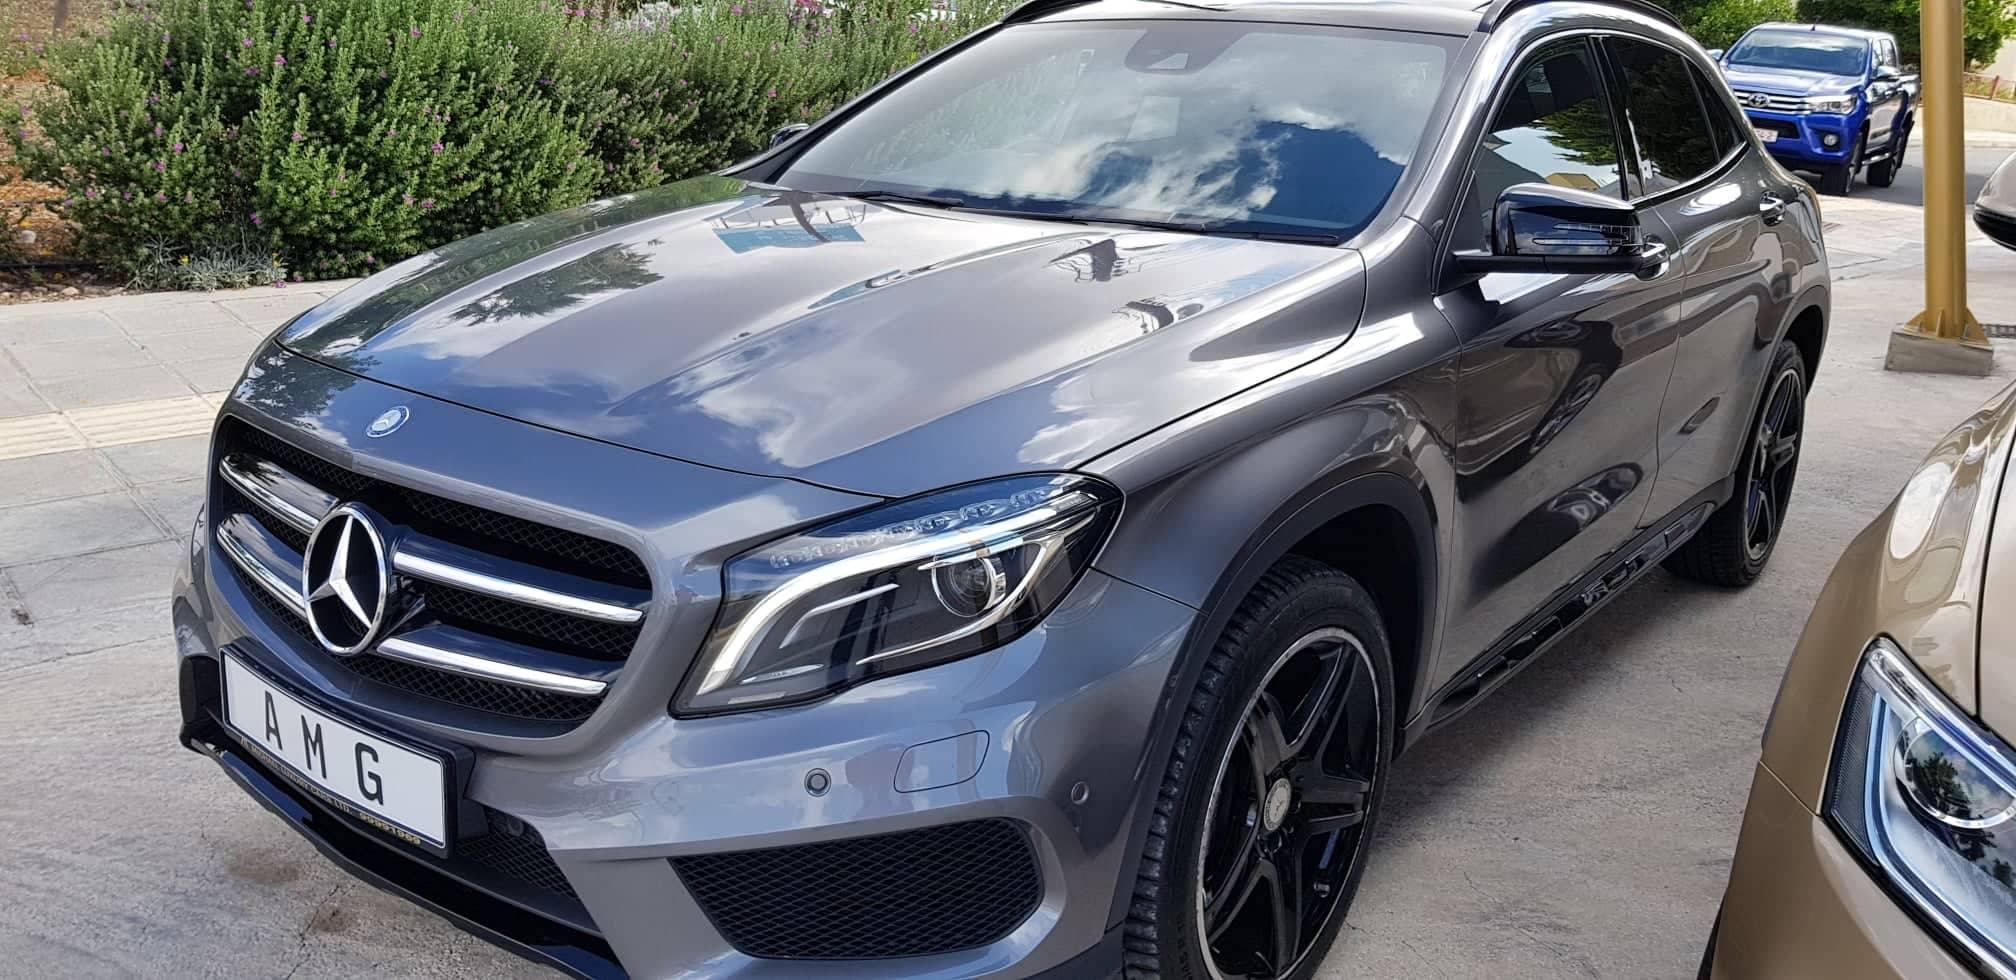 Mercedes GLA 200D – AMG Premium Line